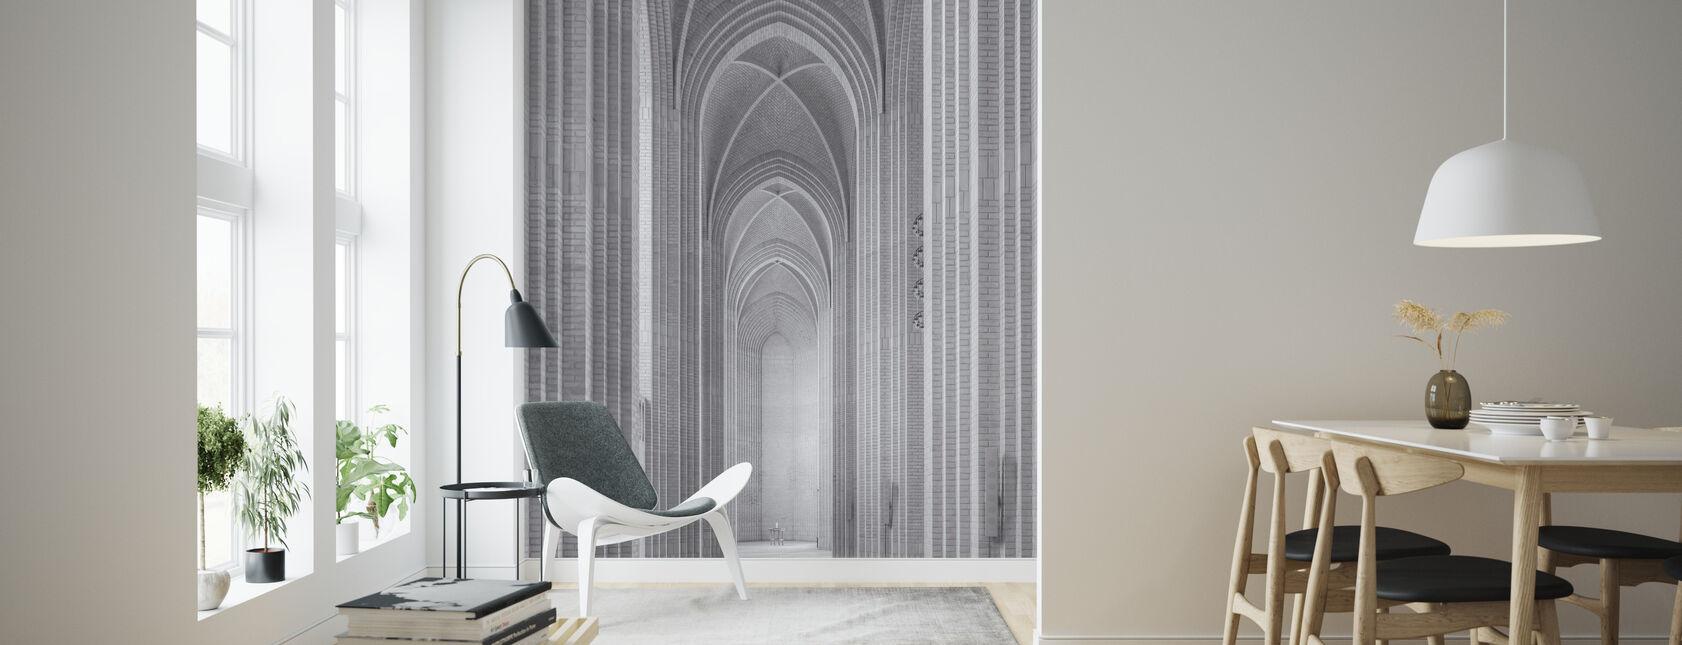 Grundtvig Church - Wallpaper - Living Room